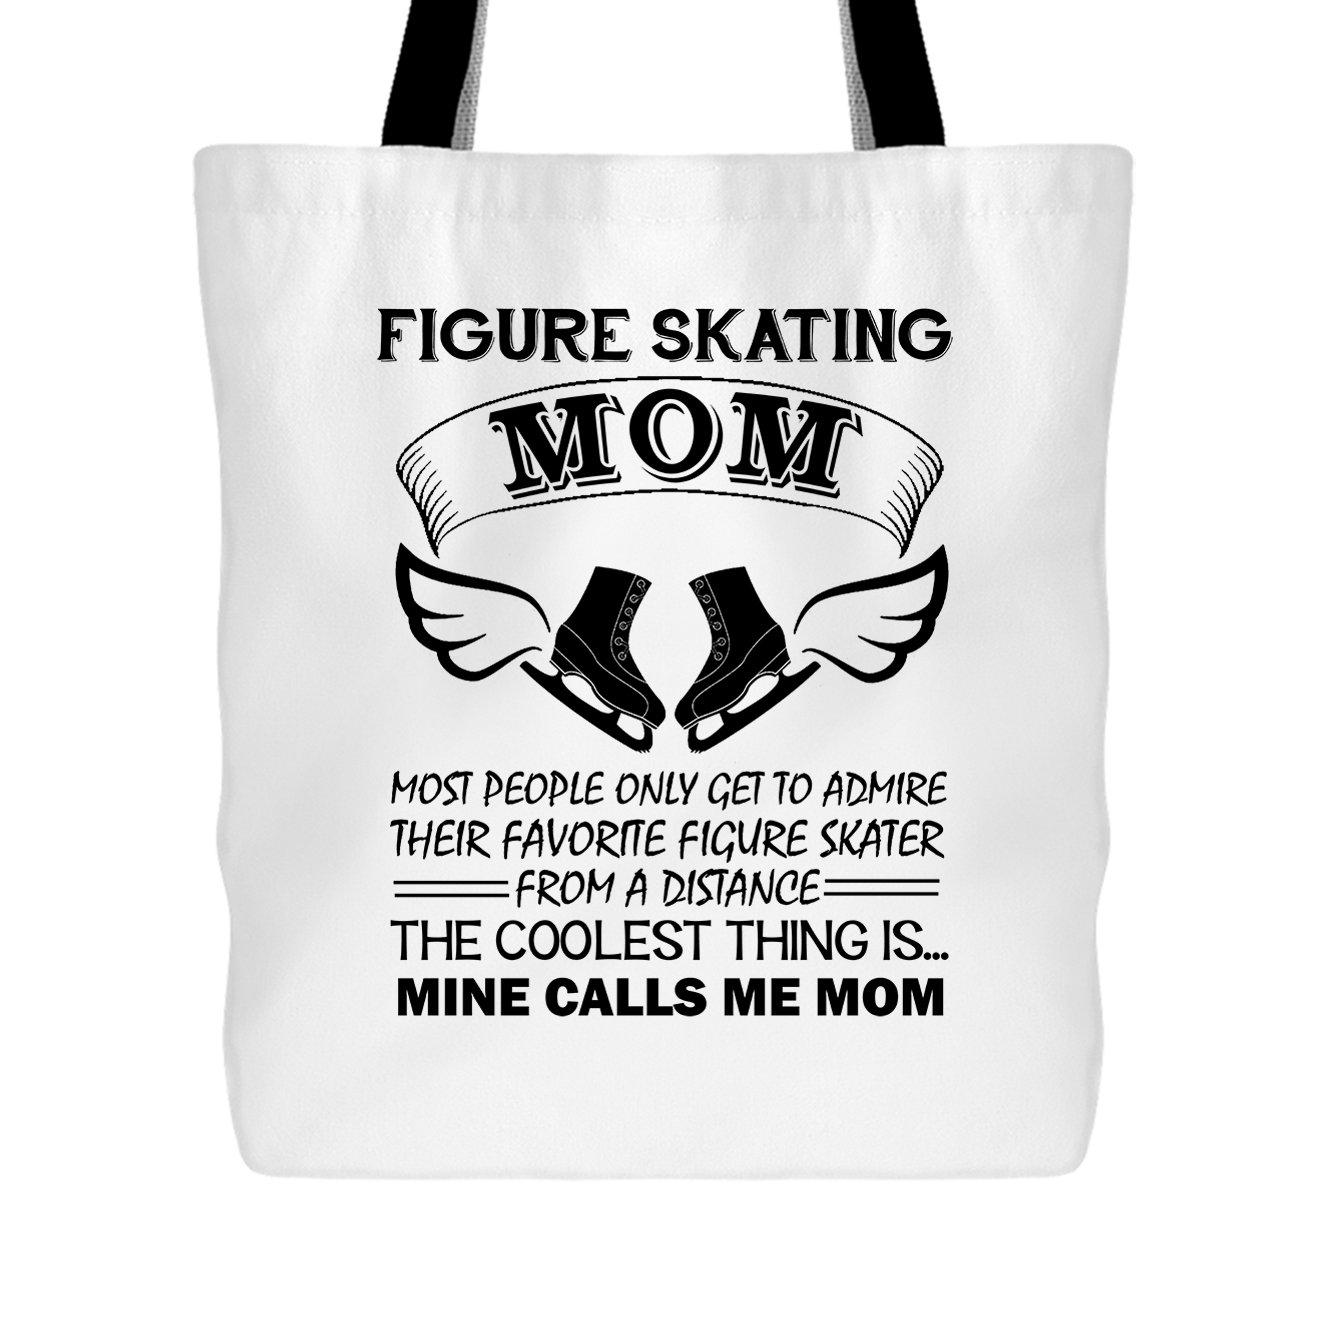 Figure Skating Tote Bag - Figure Skating Mom Handbags Design Elido Store DOTAG-ELI159-WBG